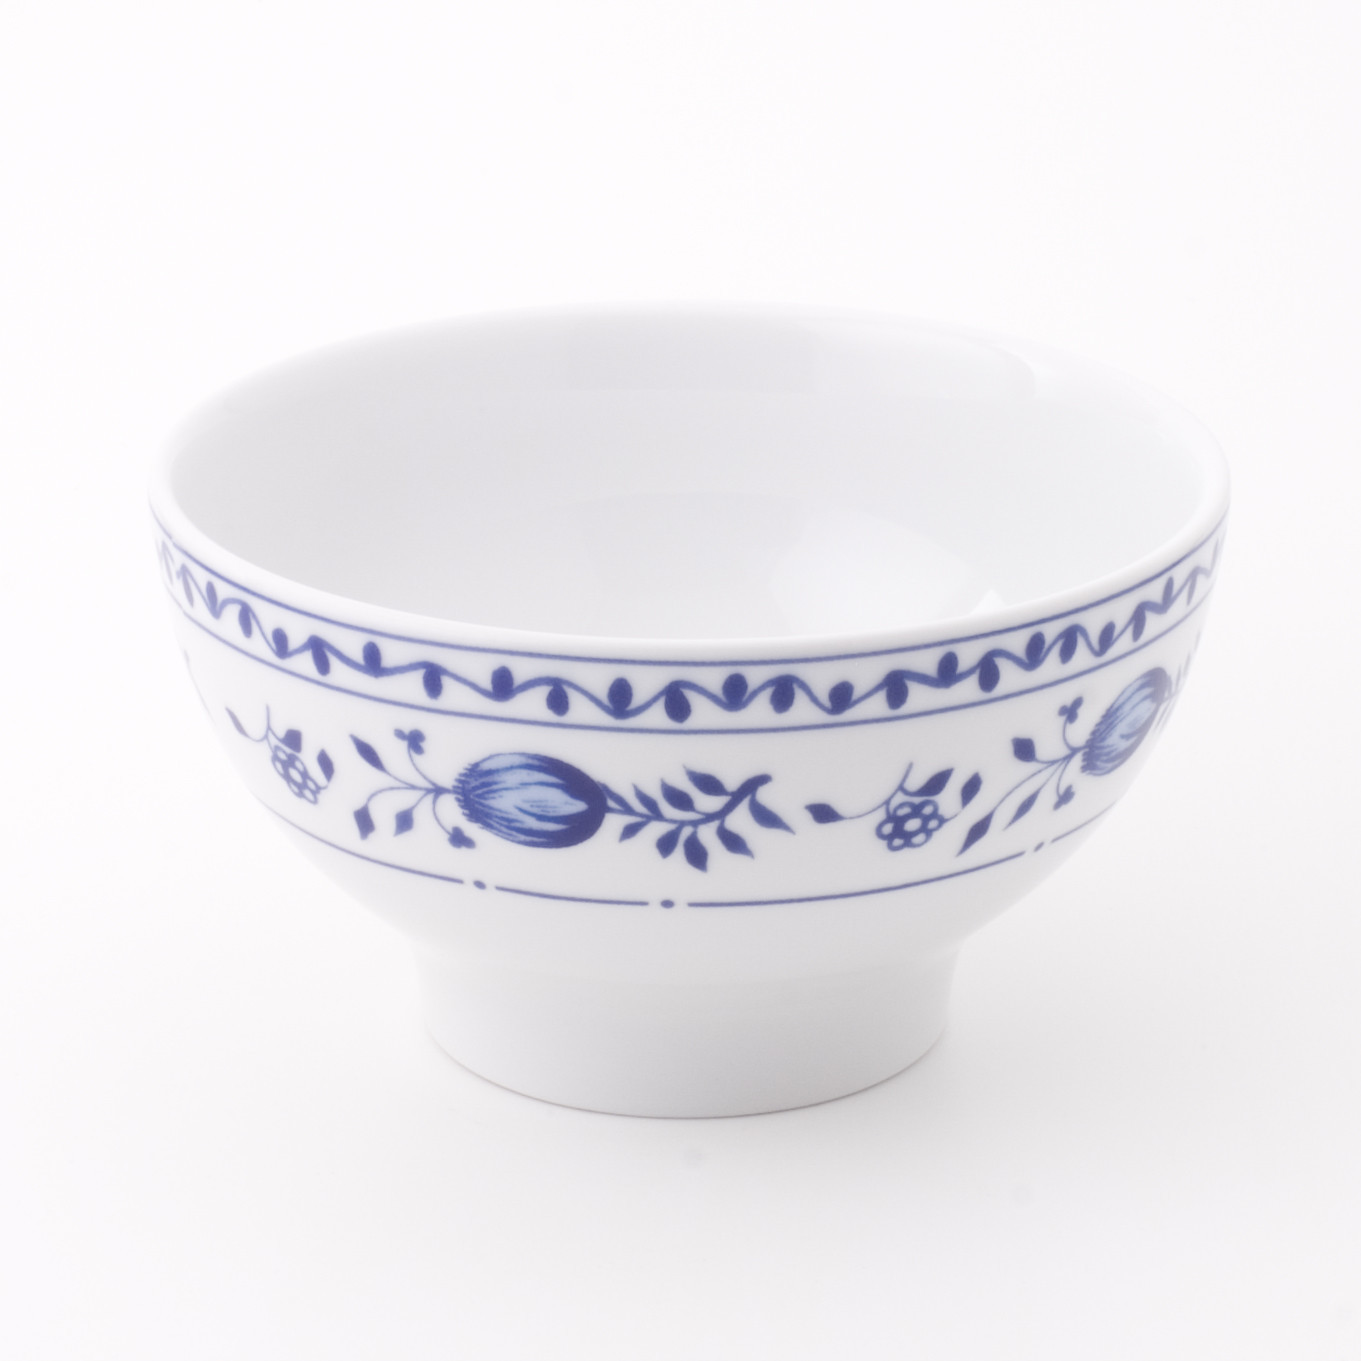 Kahla Zwiebelmuster Bowl 14 cm